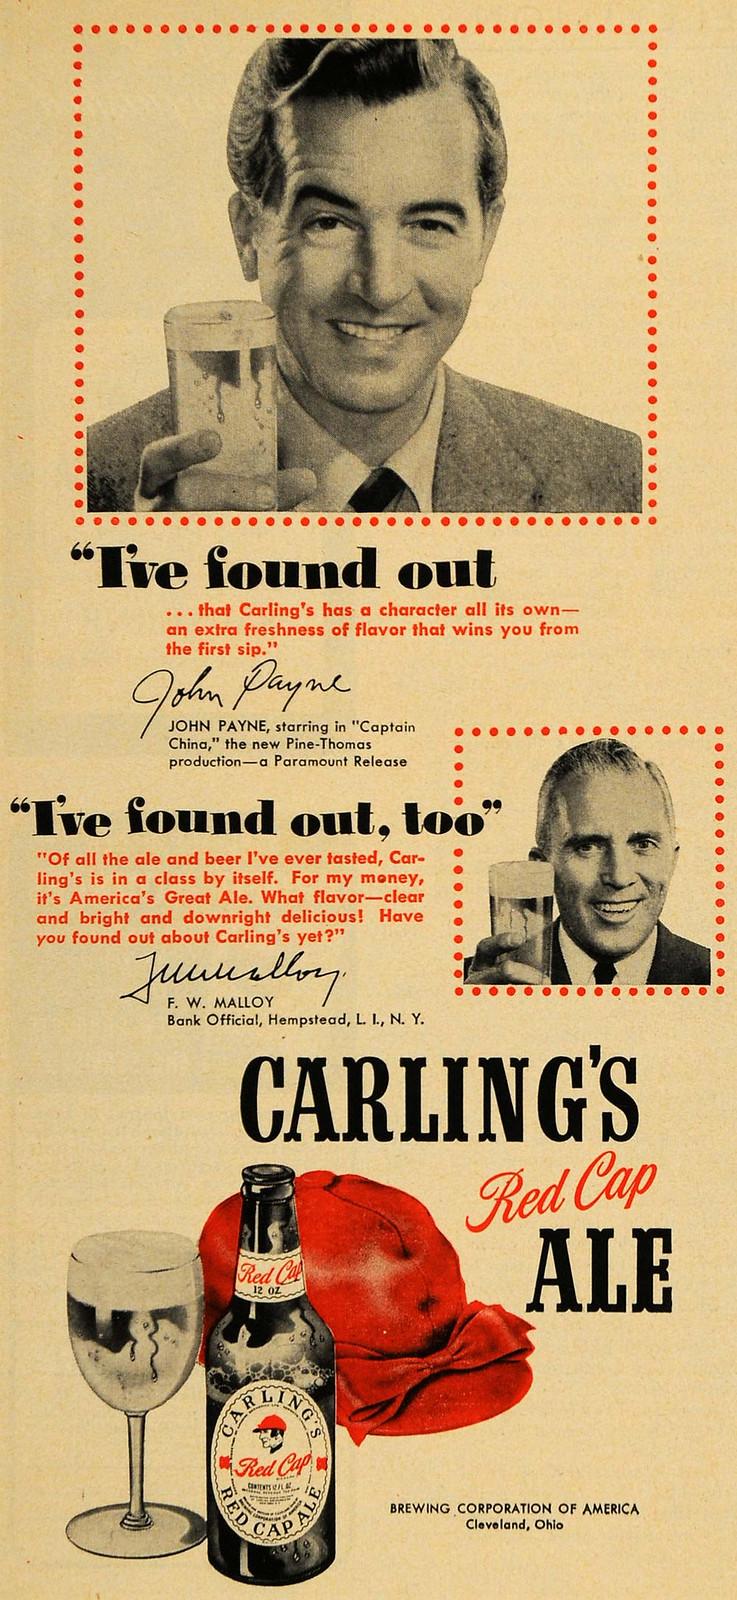 carling-1950-john-payne